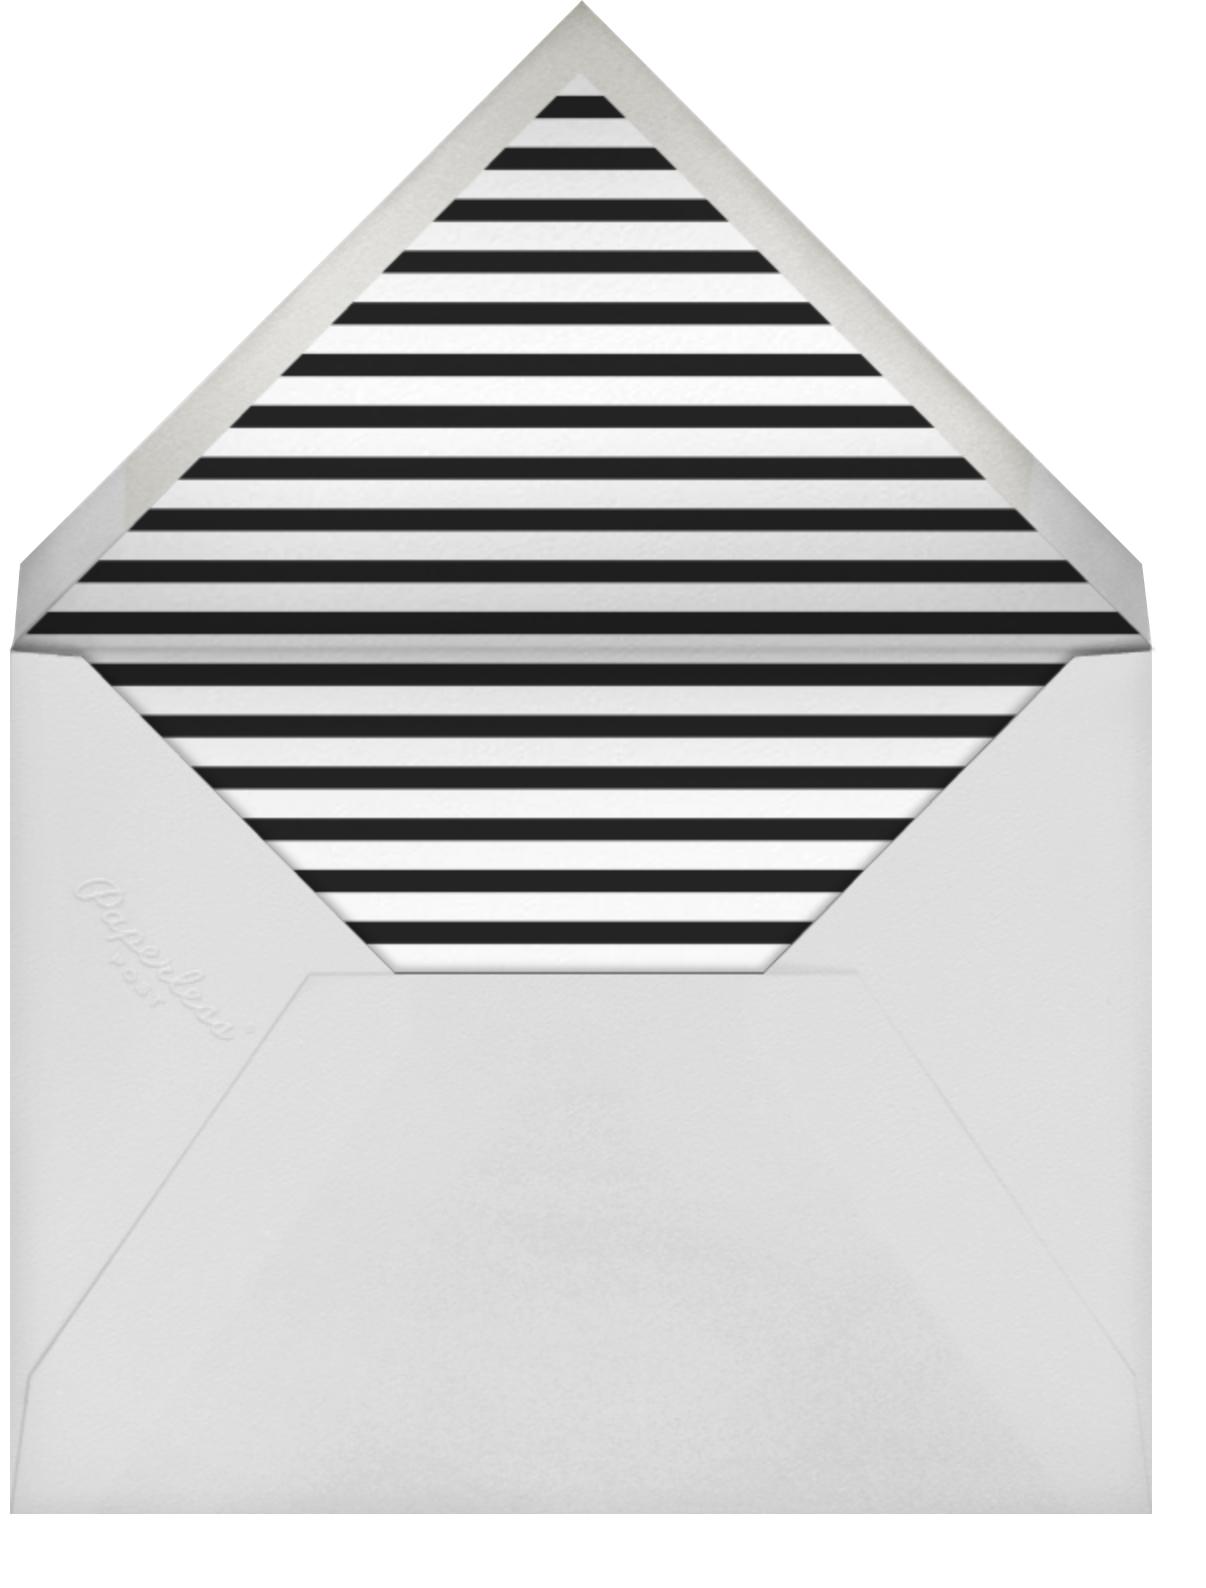 Three Photo Strips - Paperless Post - Adult birthday - envelope back